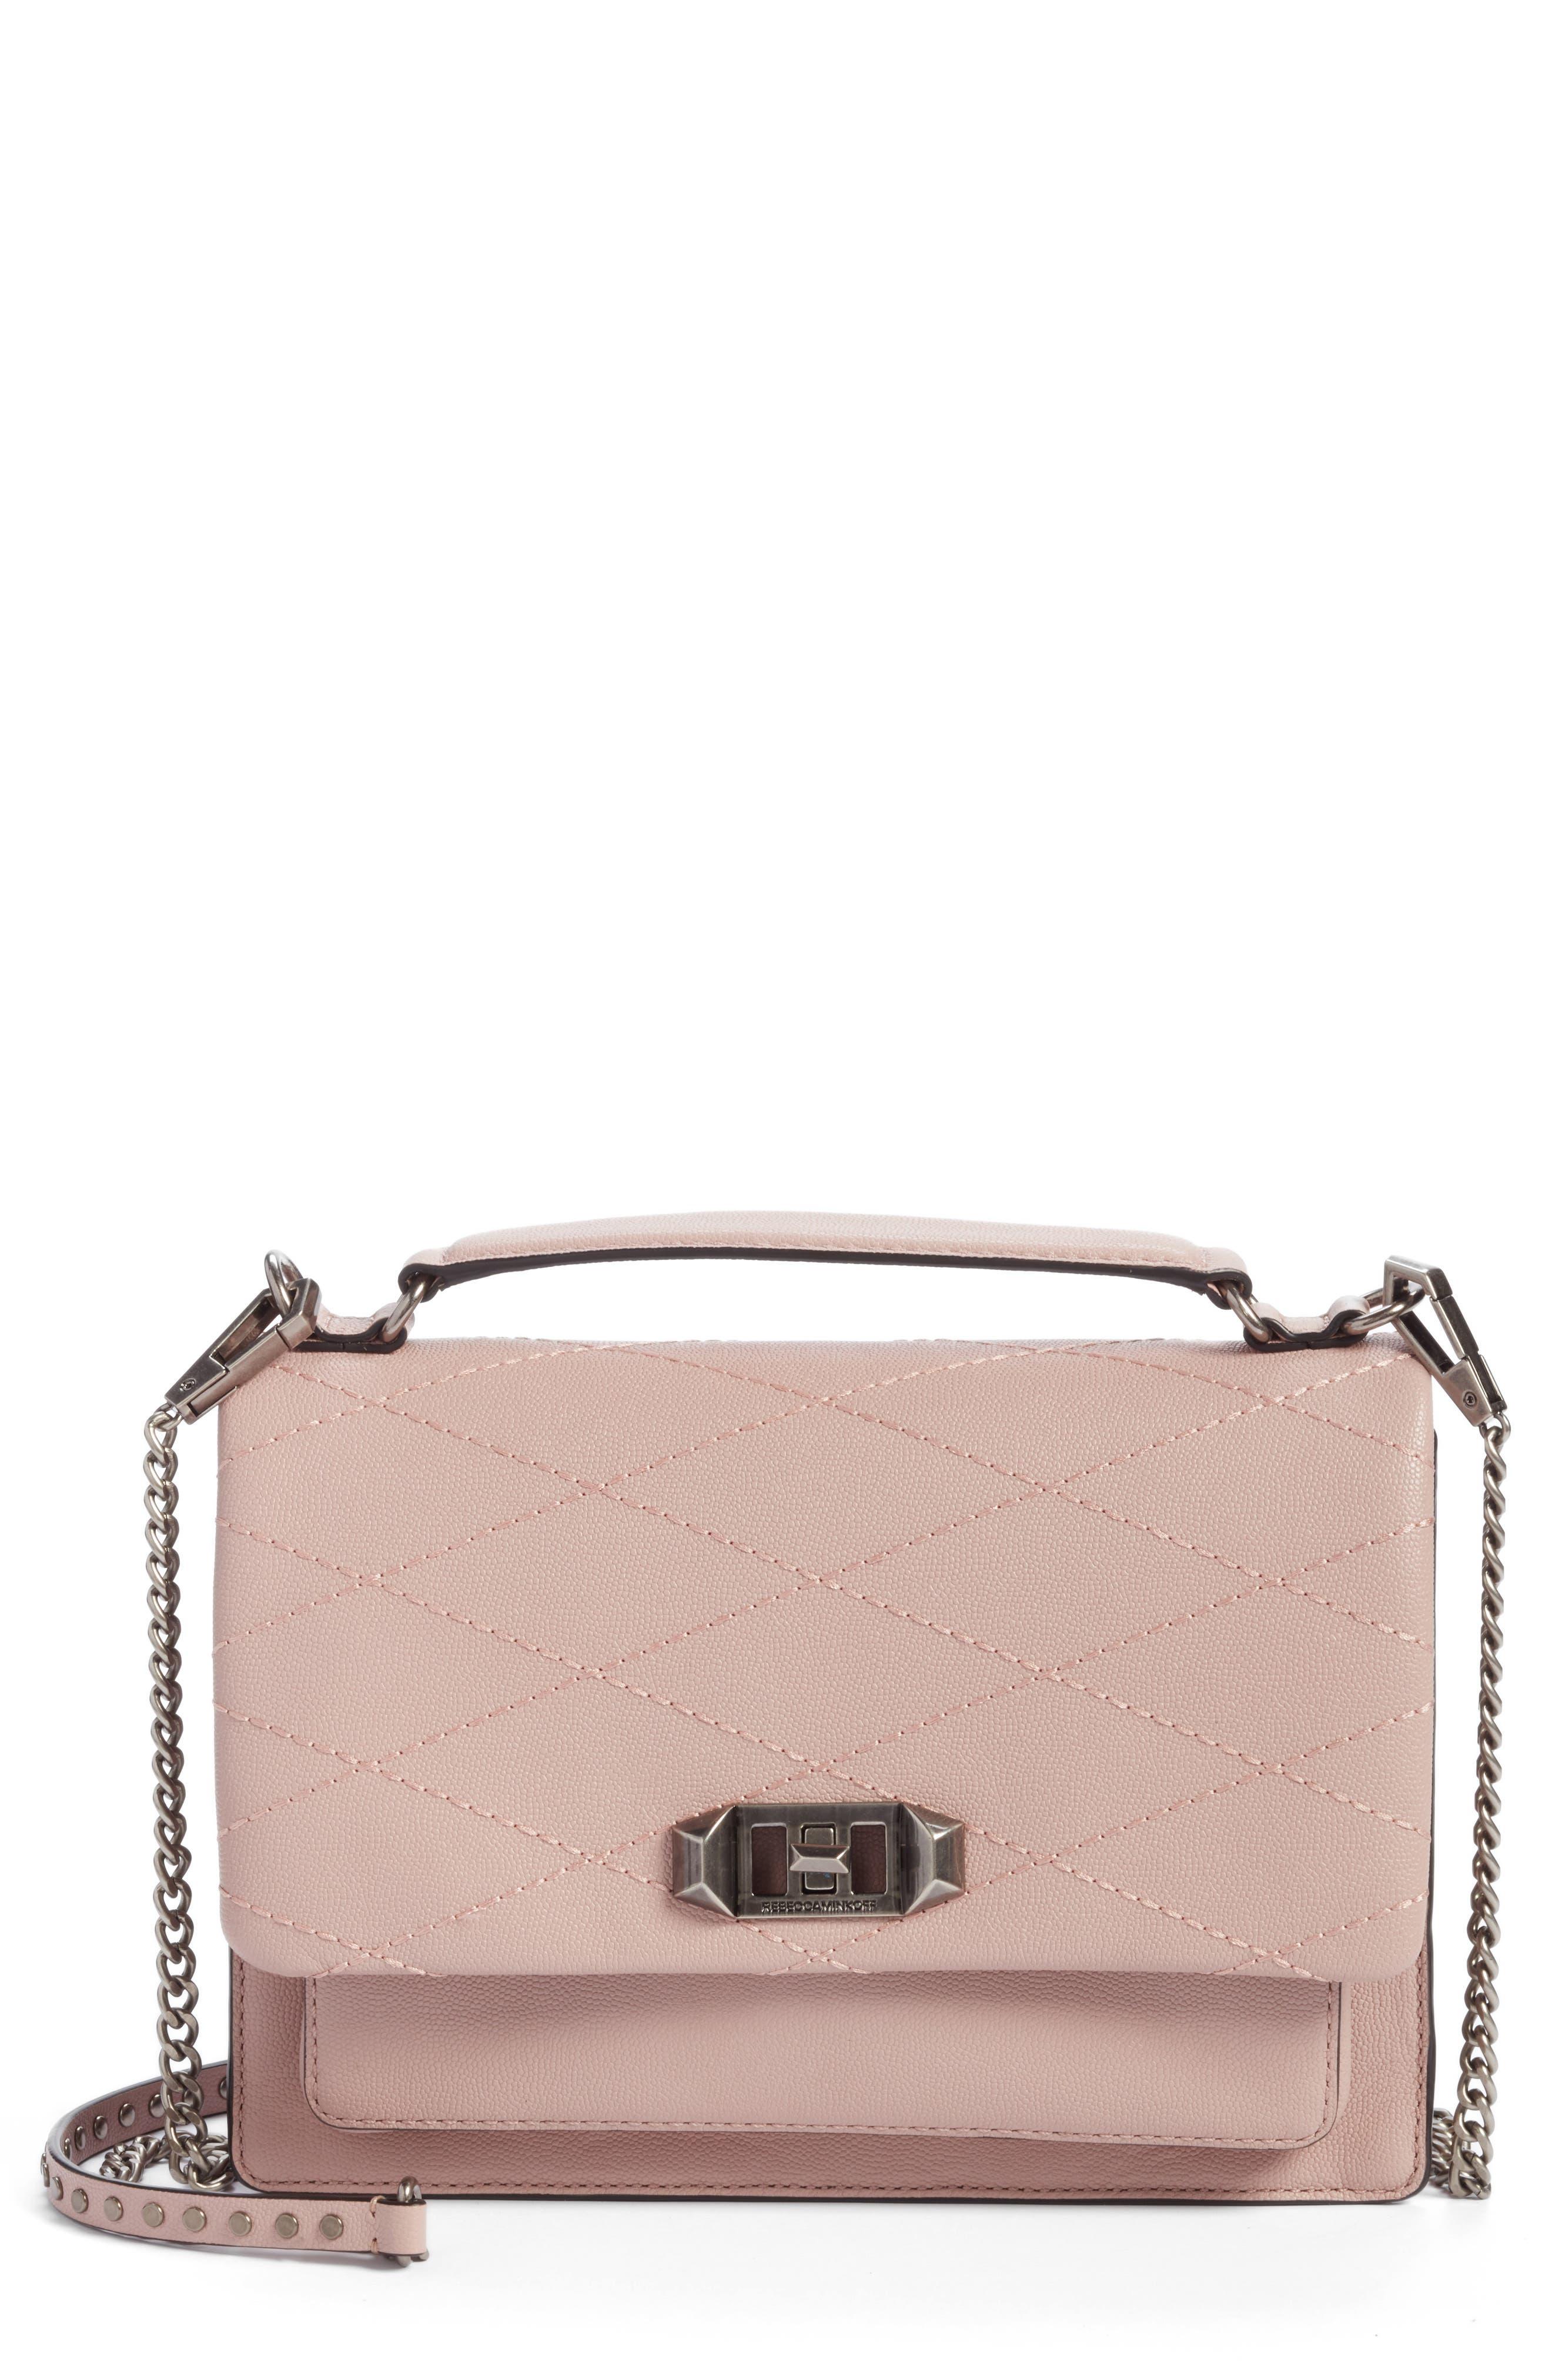 Medium Je T'aime Convertible Leather Crossbody Bag,                             Main thumbnail 8, color,